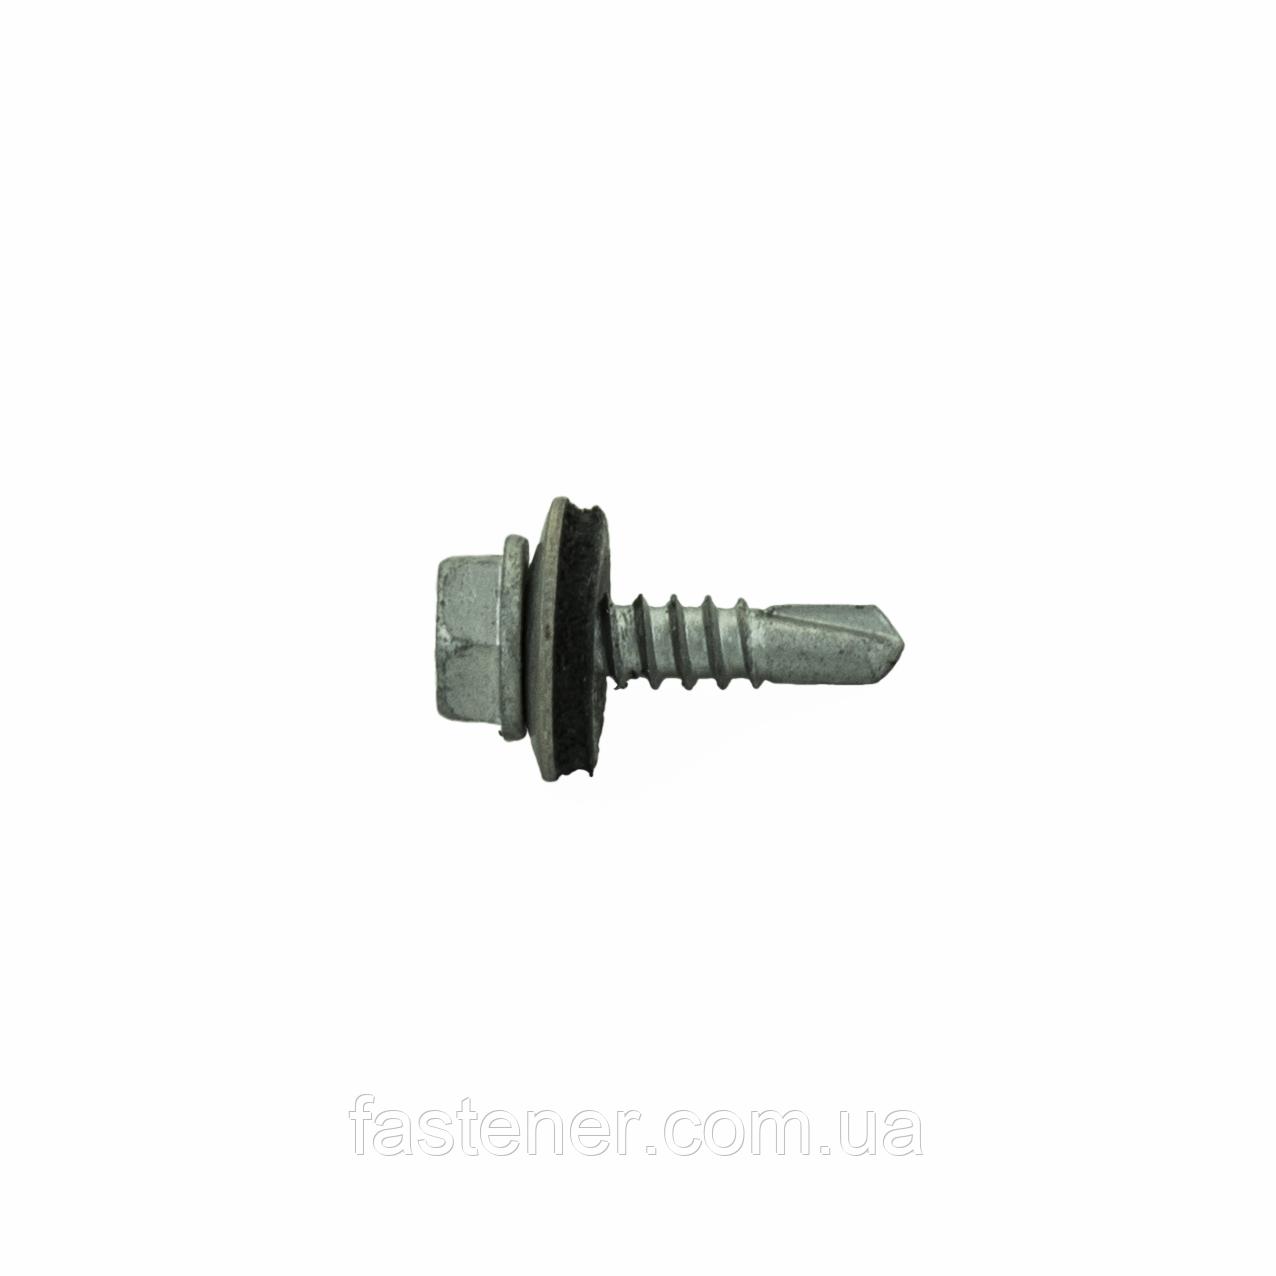 Саморез для профнастила Impax 4,8х19 с шайбой EPDM св.1,5-3,5 мм, с покр.Corrseal, уп-250 шт,ESSVE